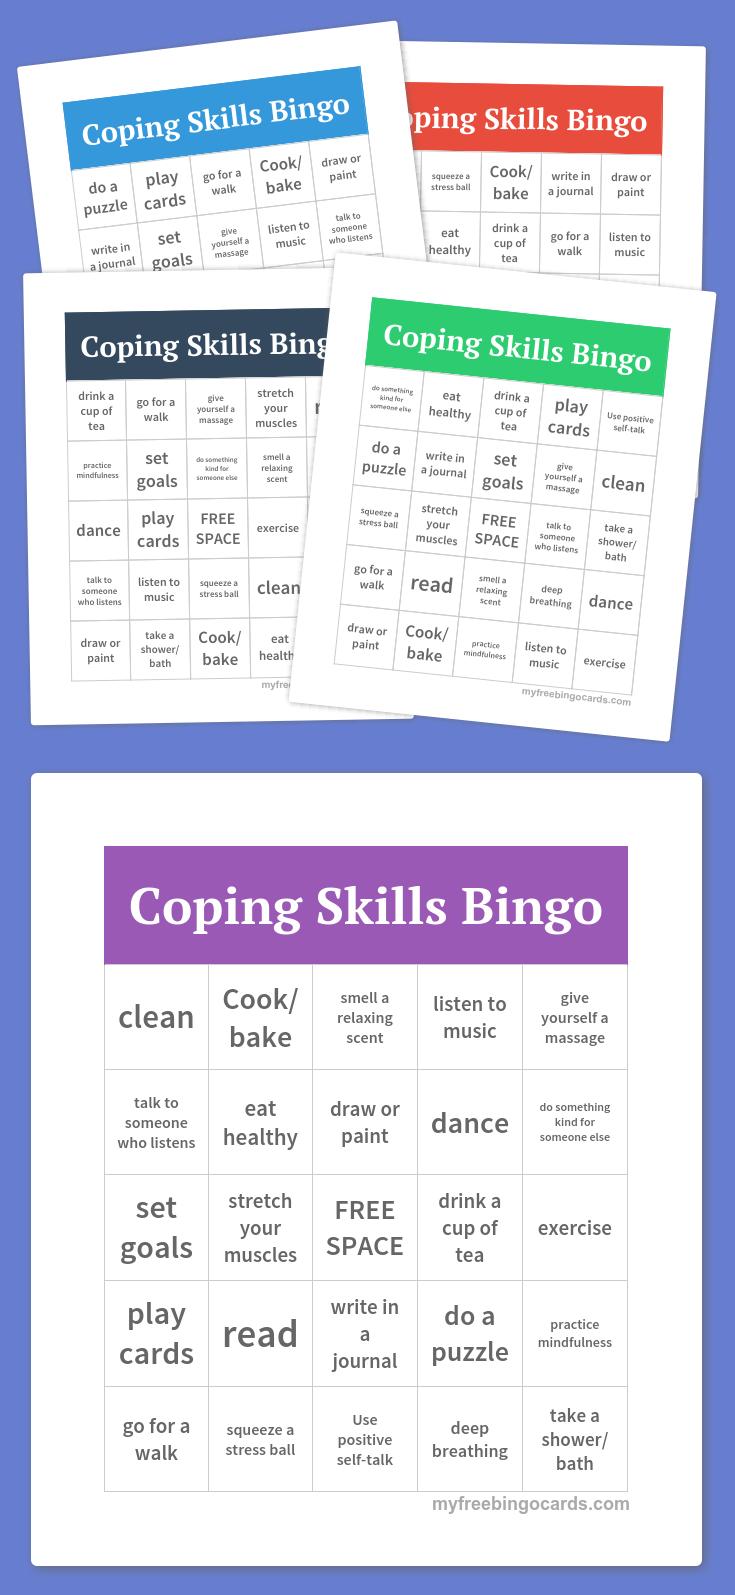 Coping Skills Bingo | Free Bingo Cards, Bingo Cards